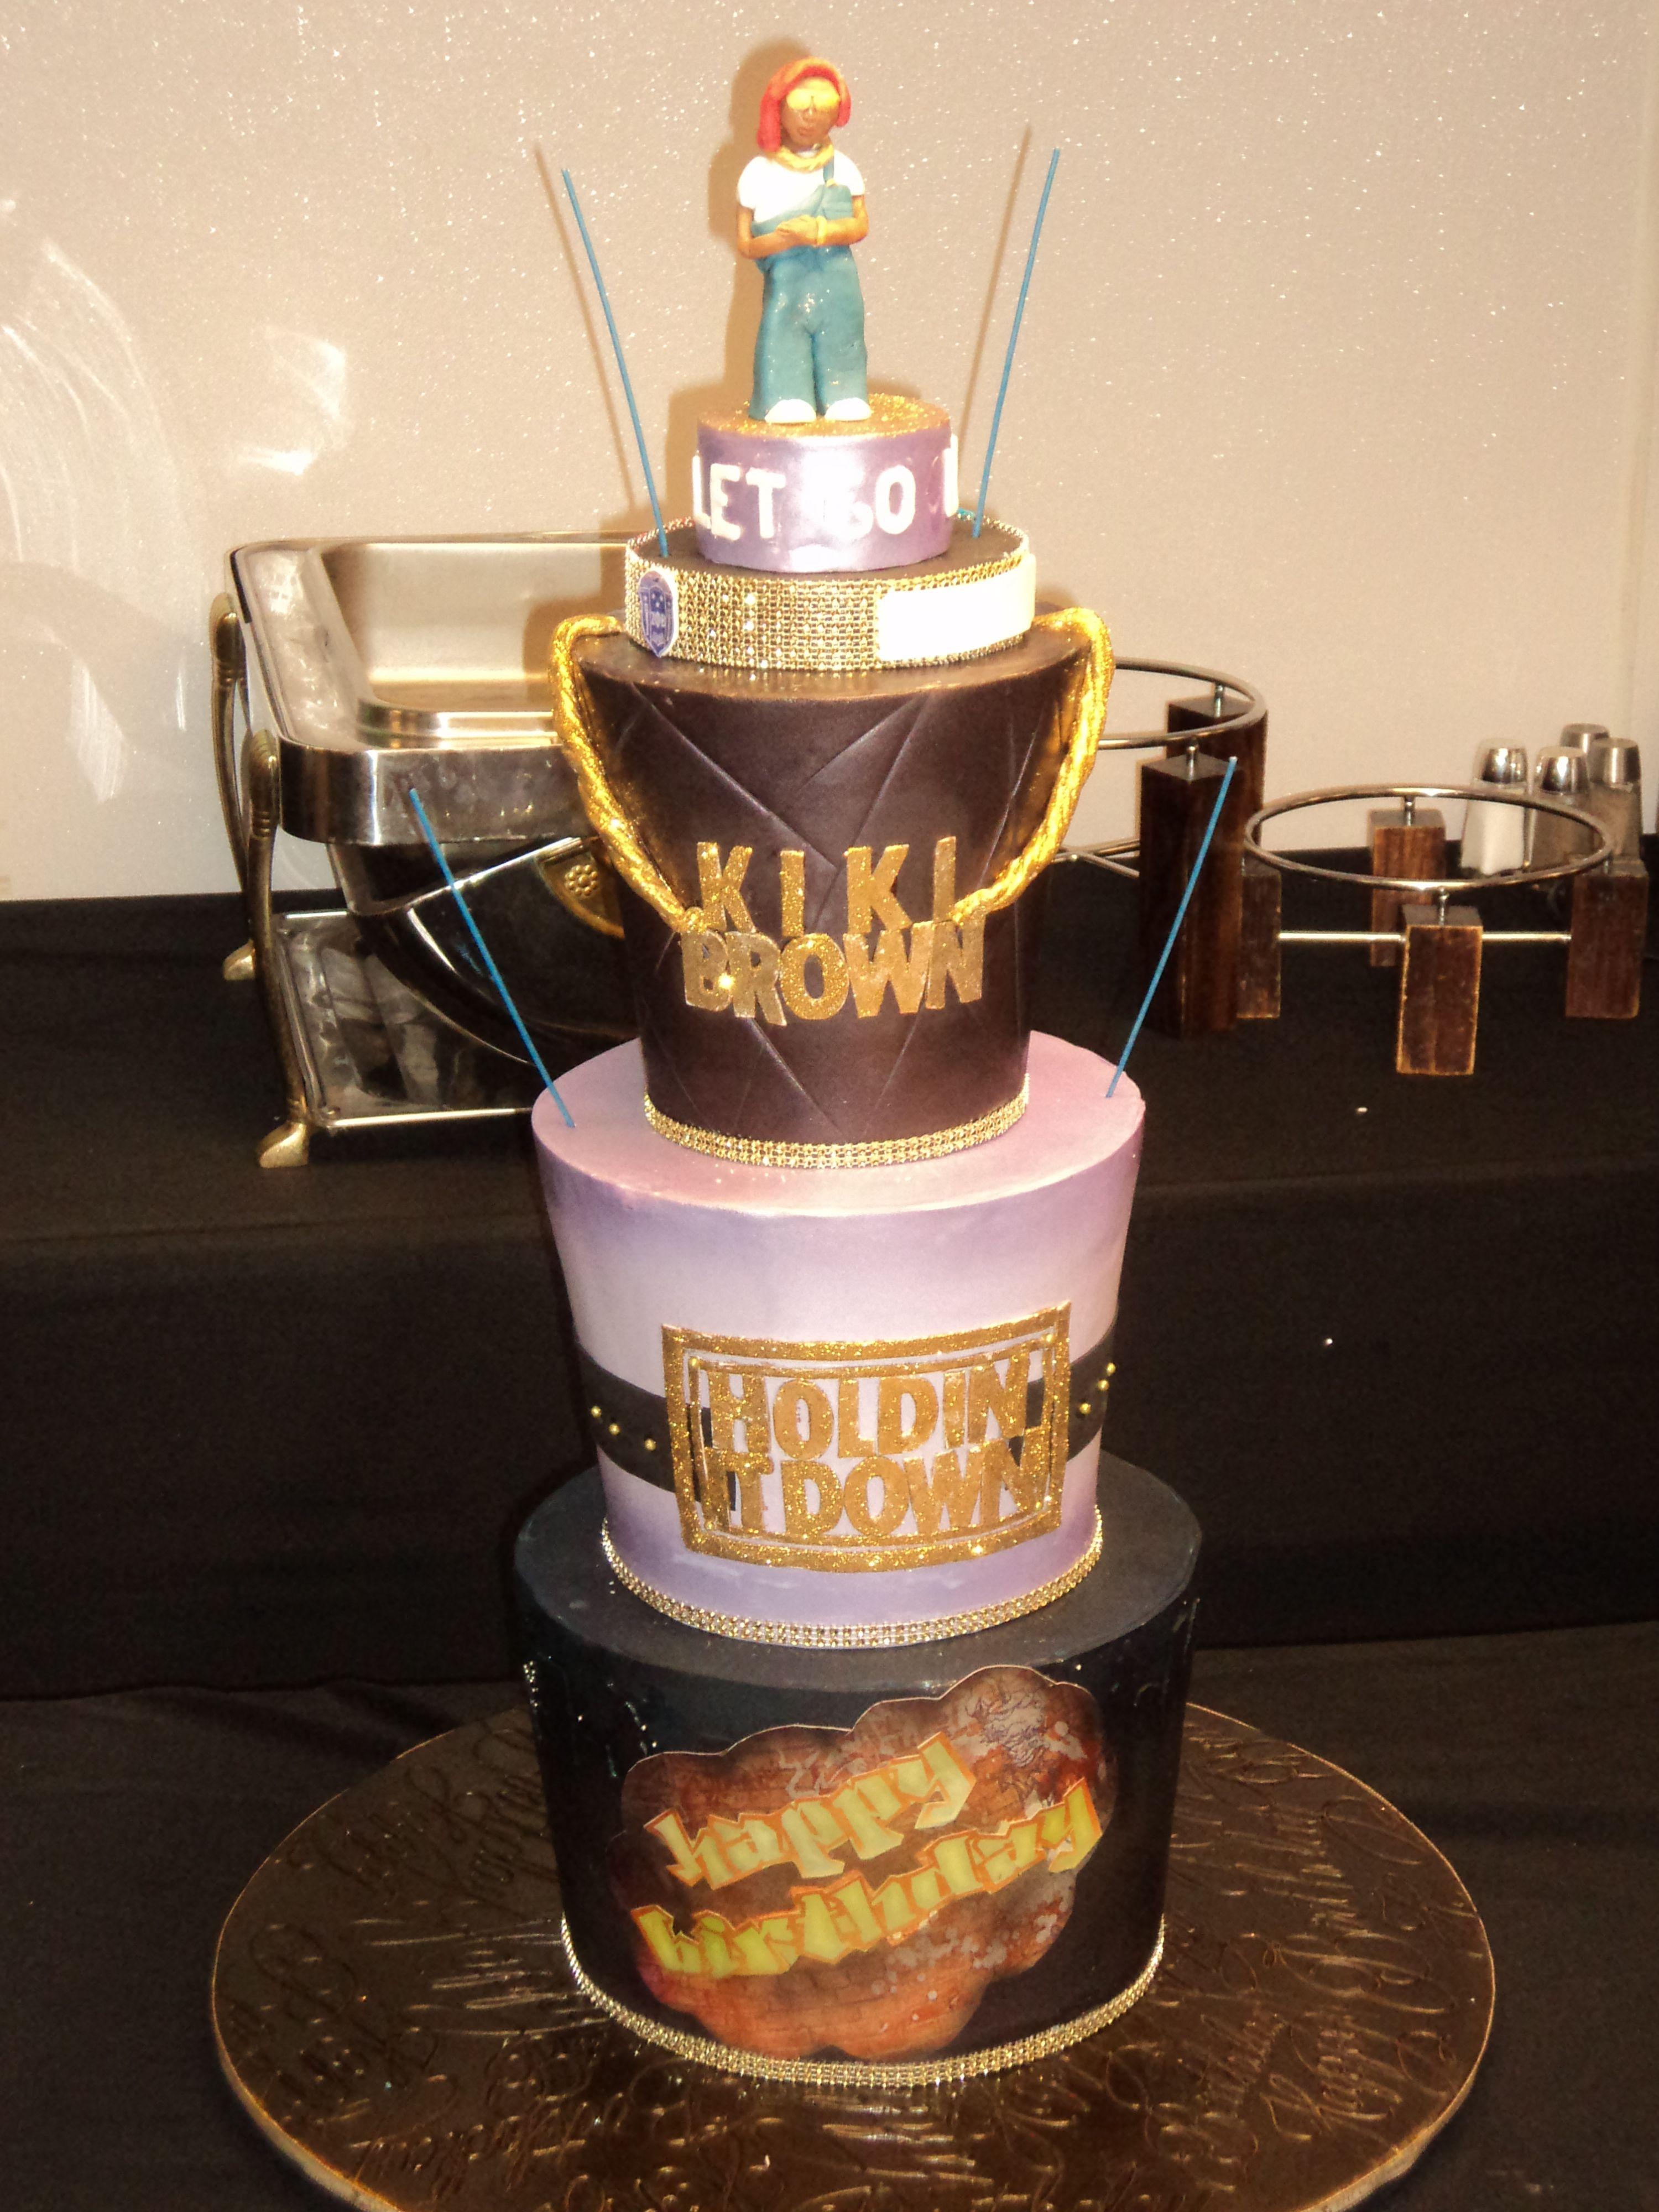 Birthday Cake for Baltimore, MD DJ Personality Kiki Brown of 92Q ...